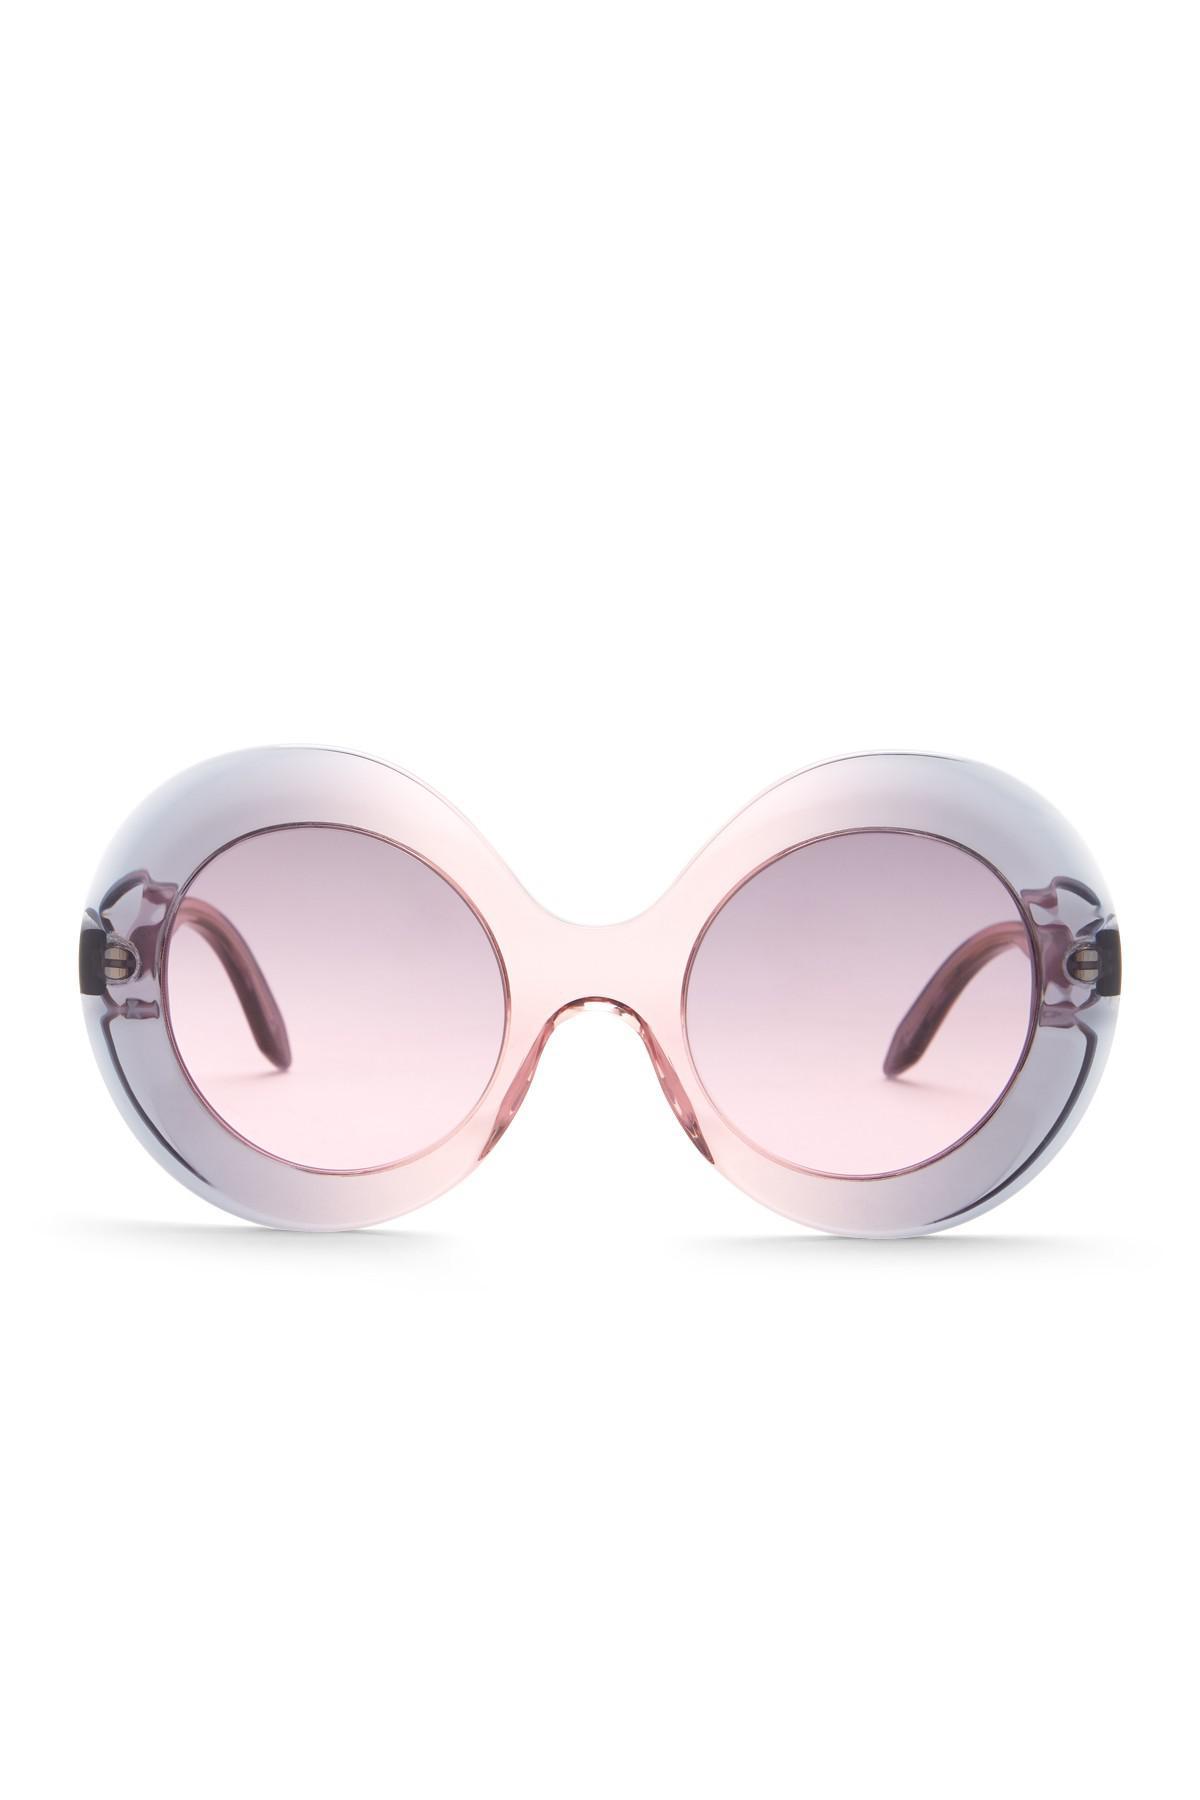 Victoria Beckham Woman D-frame Acetate Sunglasses Pastel Pink Size Victoria Beckham NNk1COID3T